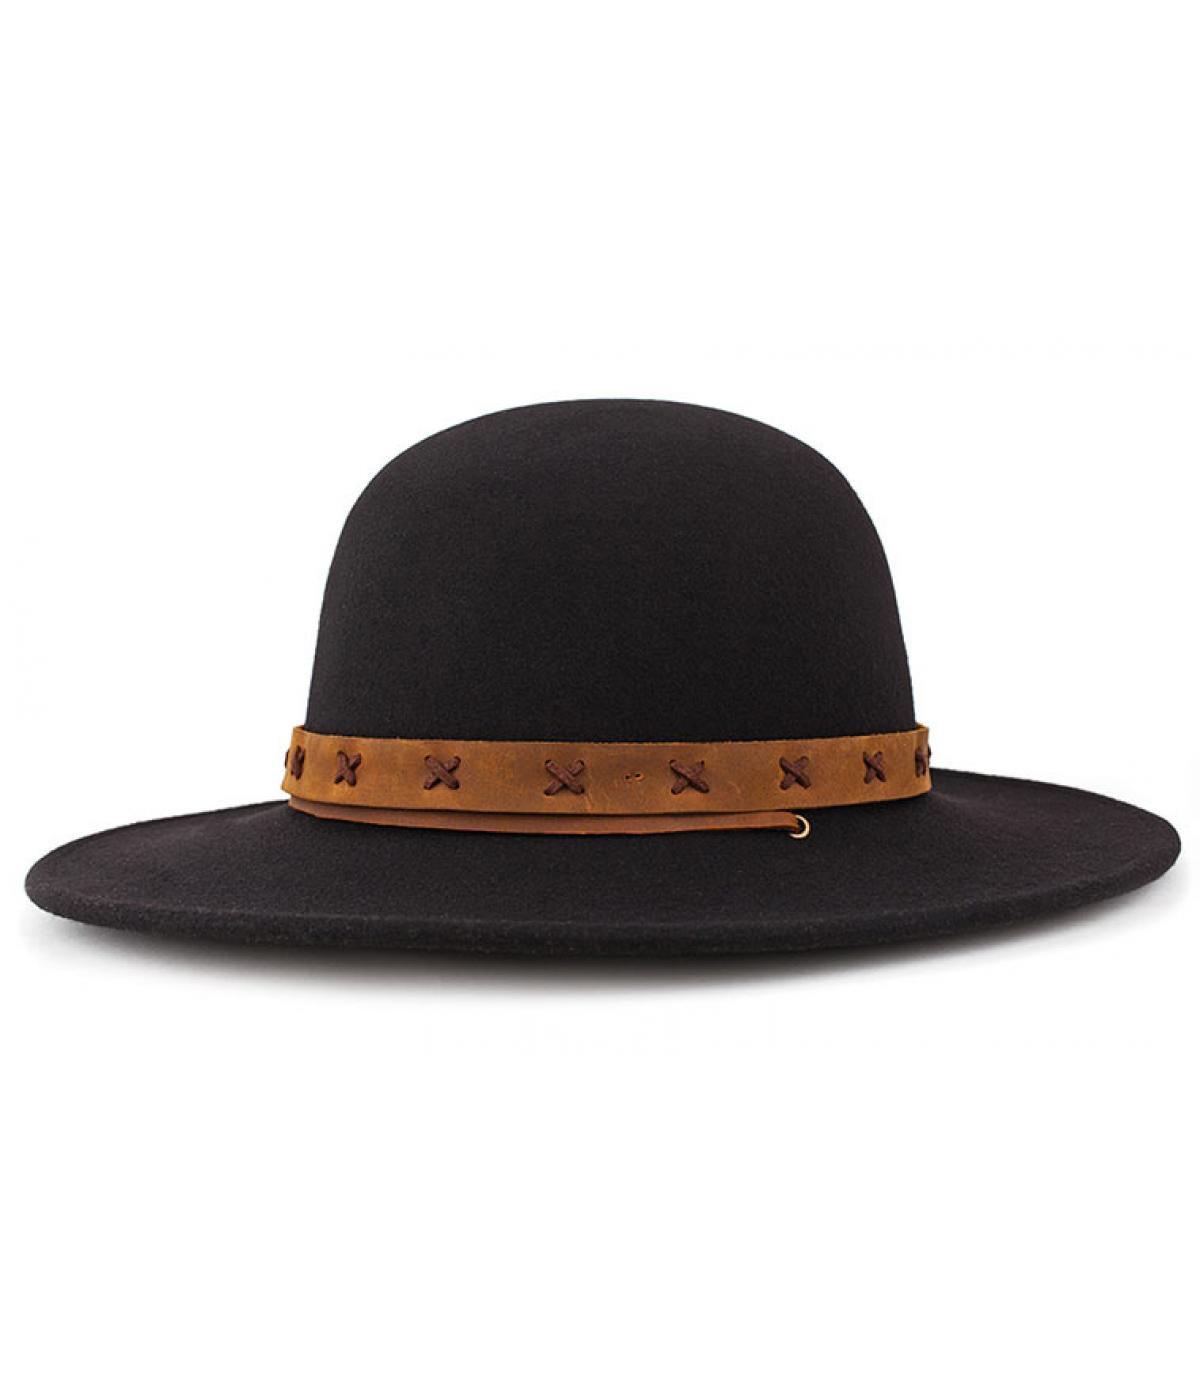 Sombrero hombre feutre Brixton